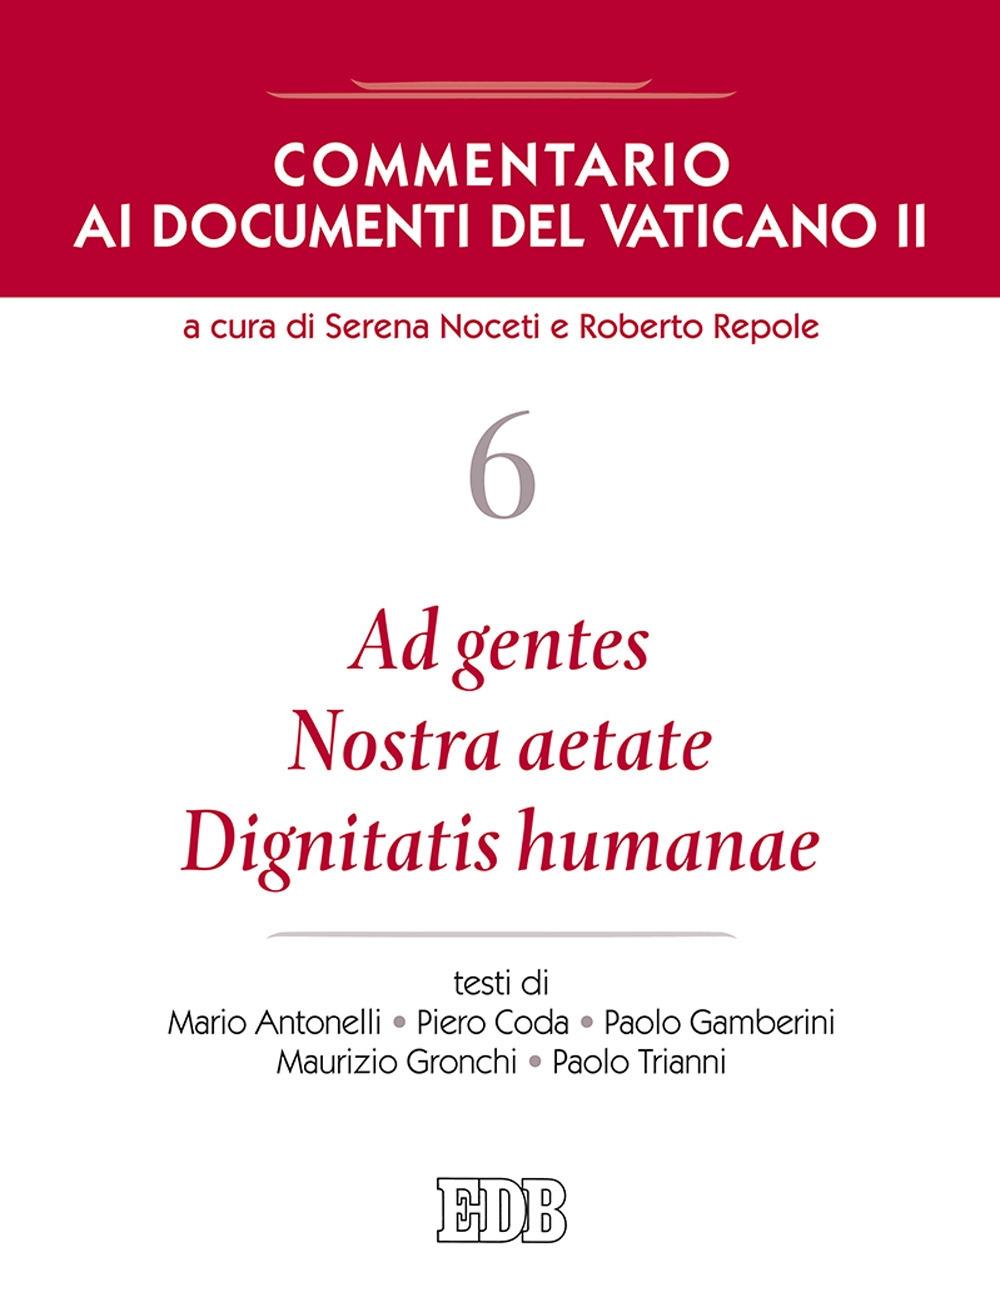 Commentario ai documenti del Vaticano II. Vol. 6: Ad gentes. Nostra aetate. Dignitatis humanae